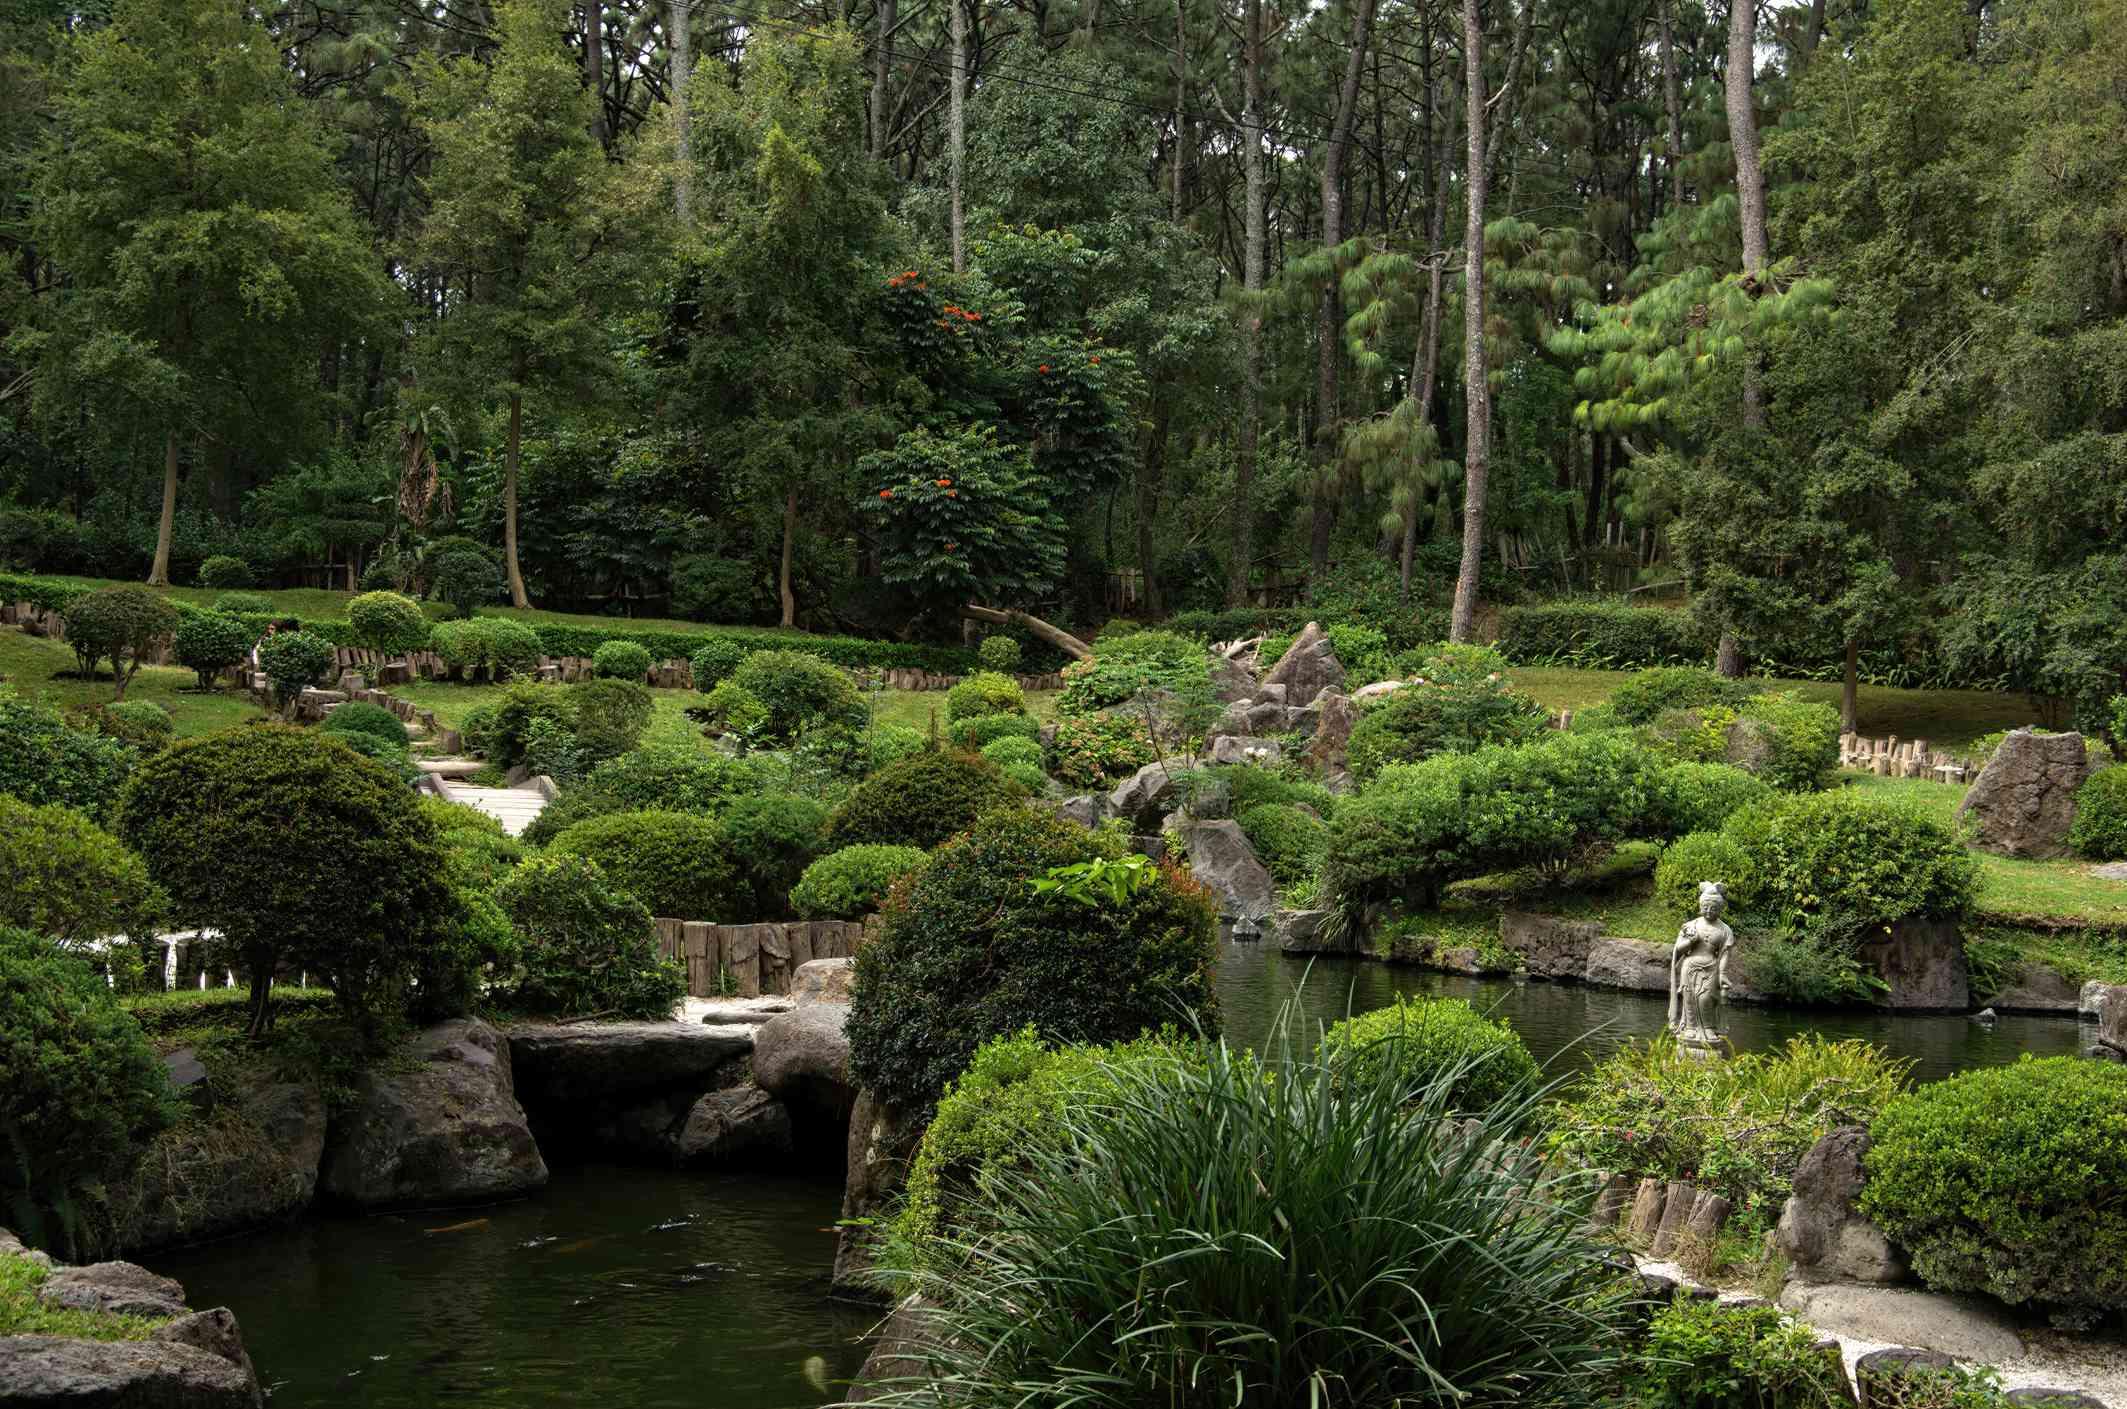 A koi pond hidden among bushes.